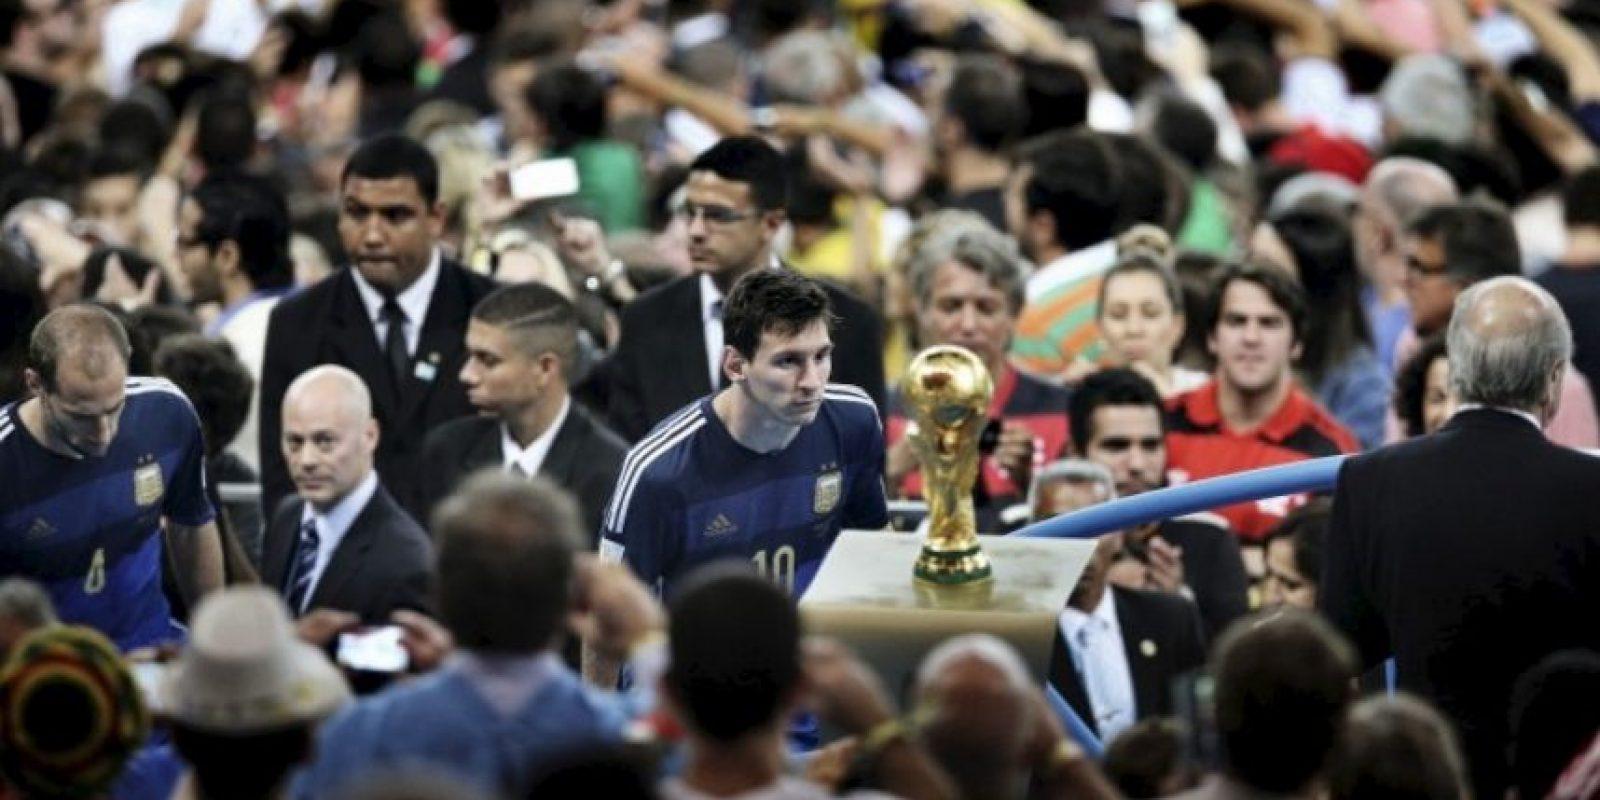 "Primer lugar ""Deportes"": Bao Tailiang, de China, muestra el momento en que Lionel Messi observa la Copa del Mundo. Argentina perdió la final en contra de Alemania 1-0. Foto:World Press Photo 2015"